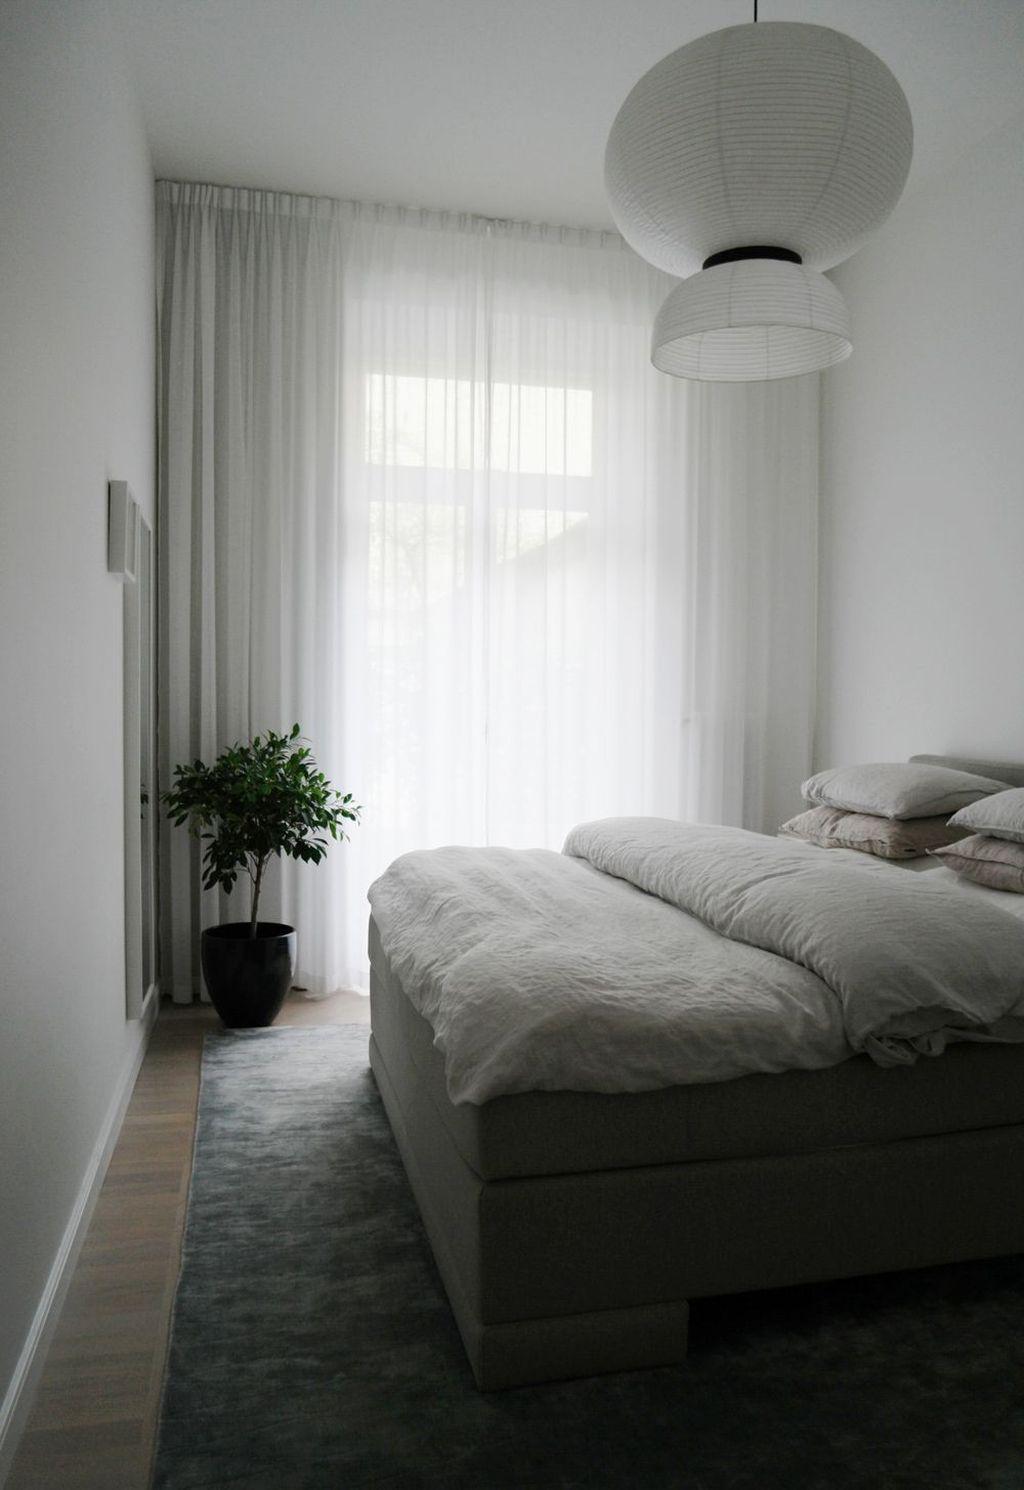 Makeover tips small living rooms minimalist interior home design decorating also simple decor ideas rh pinterest